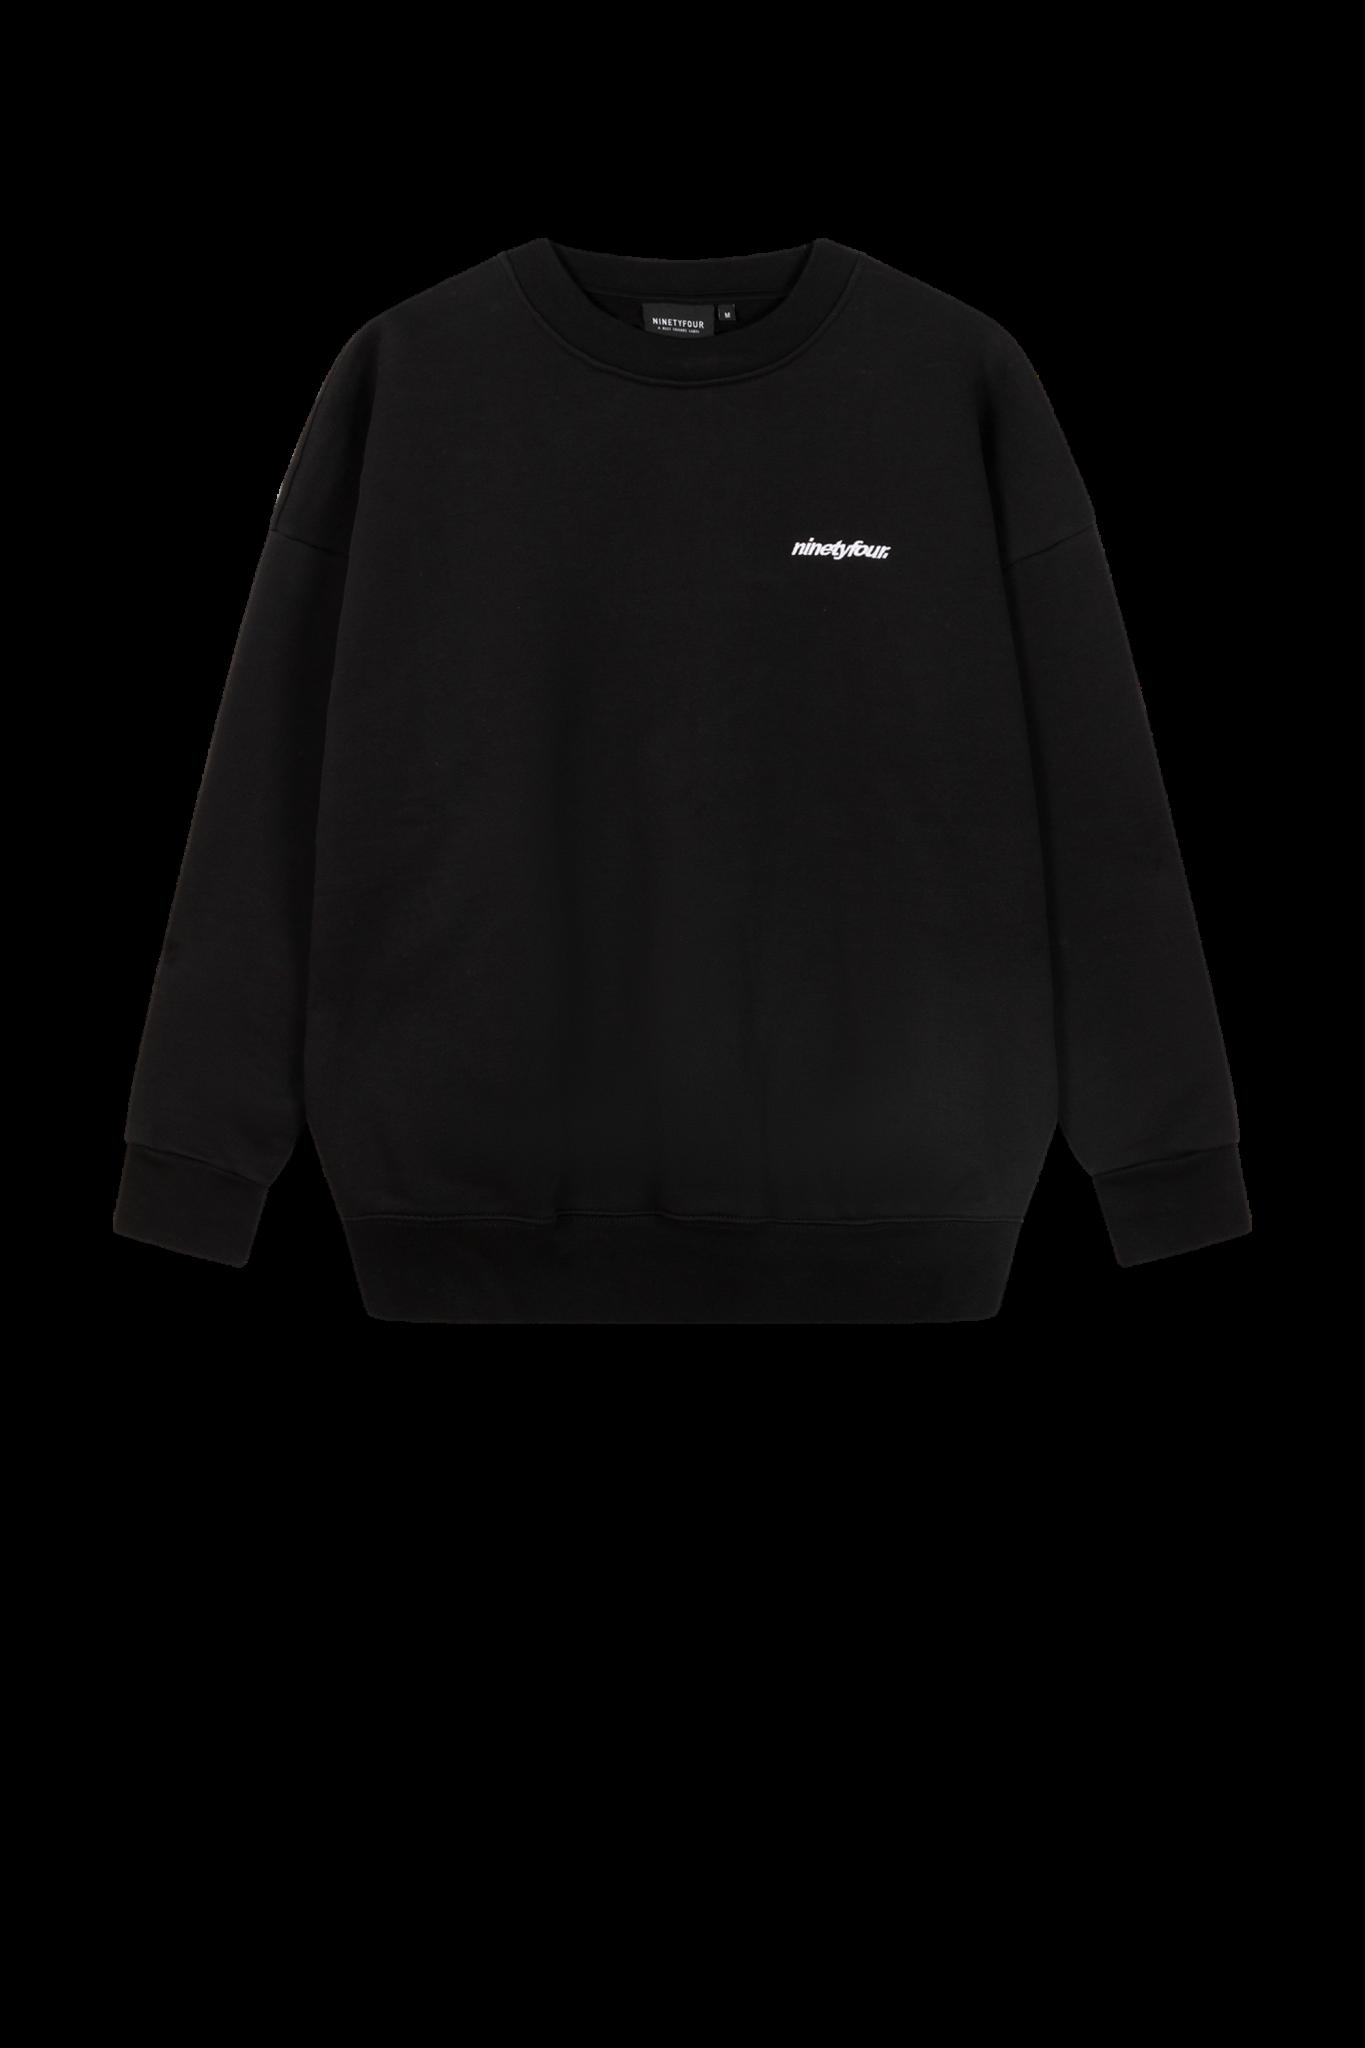 Warm Ups Sweater - Black-1